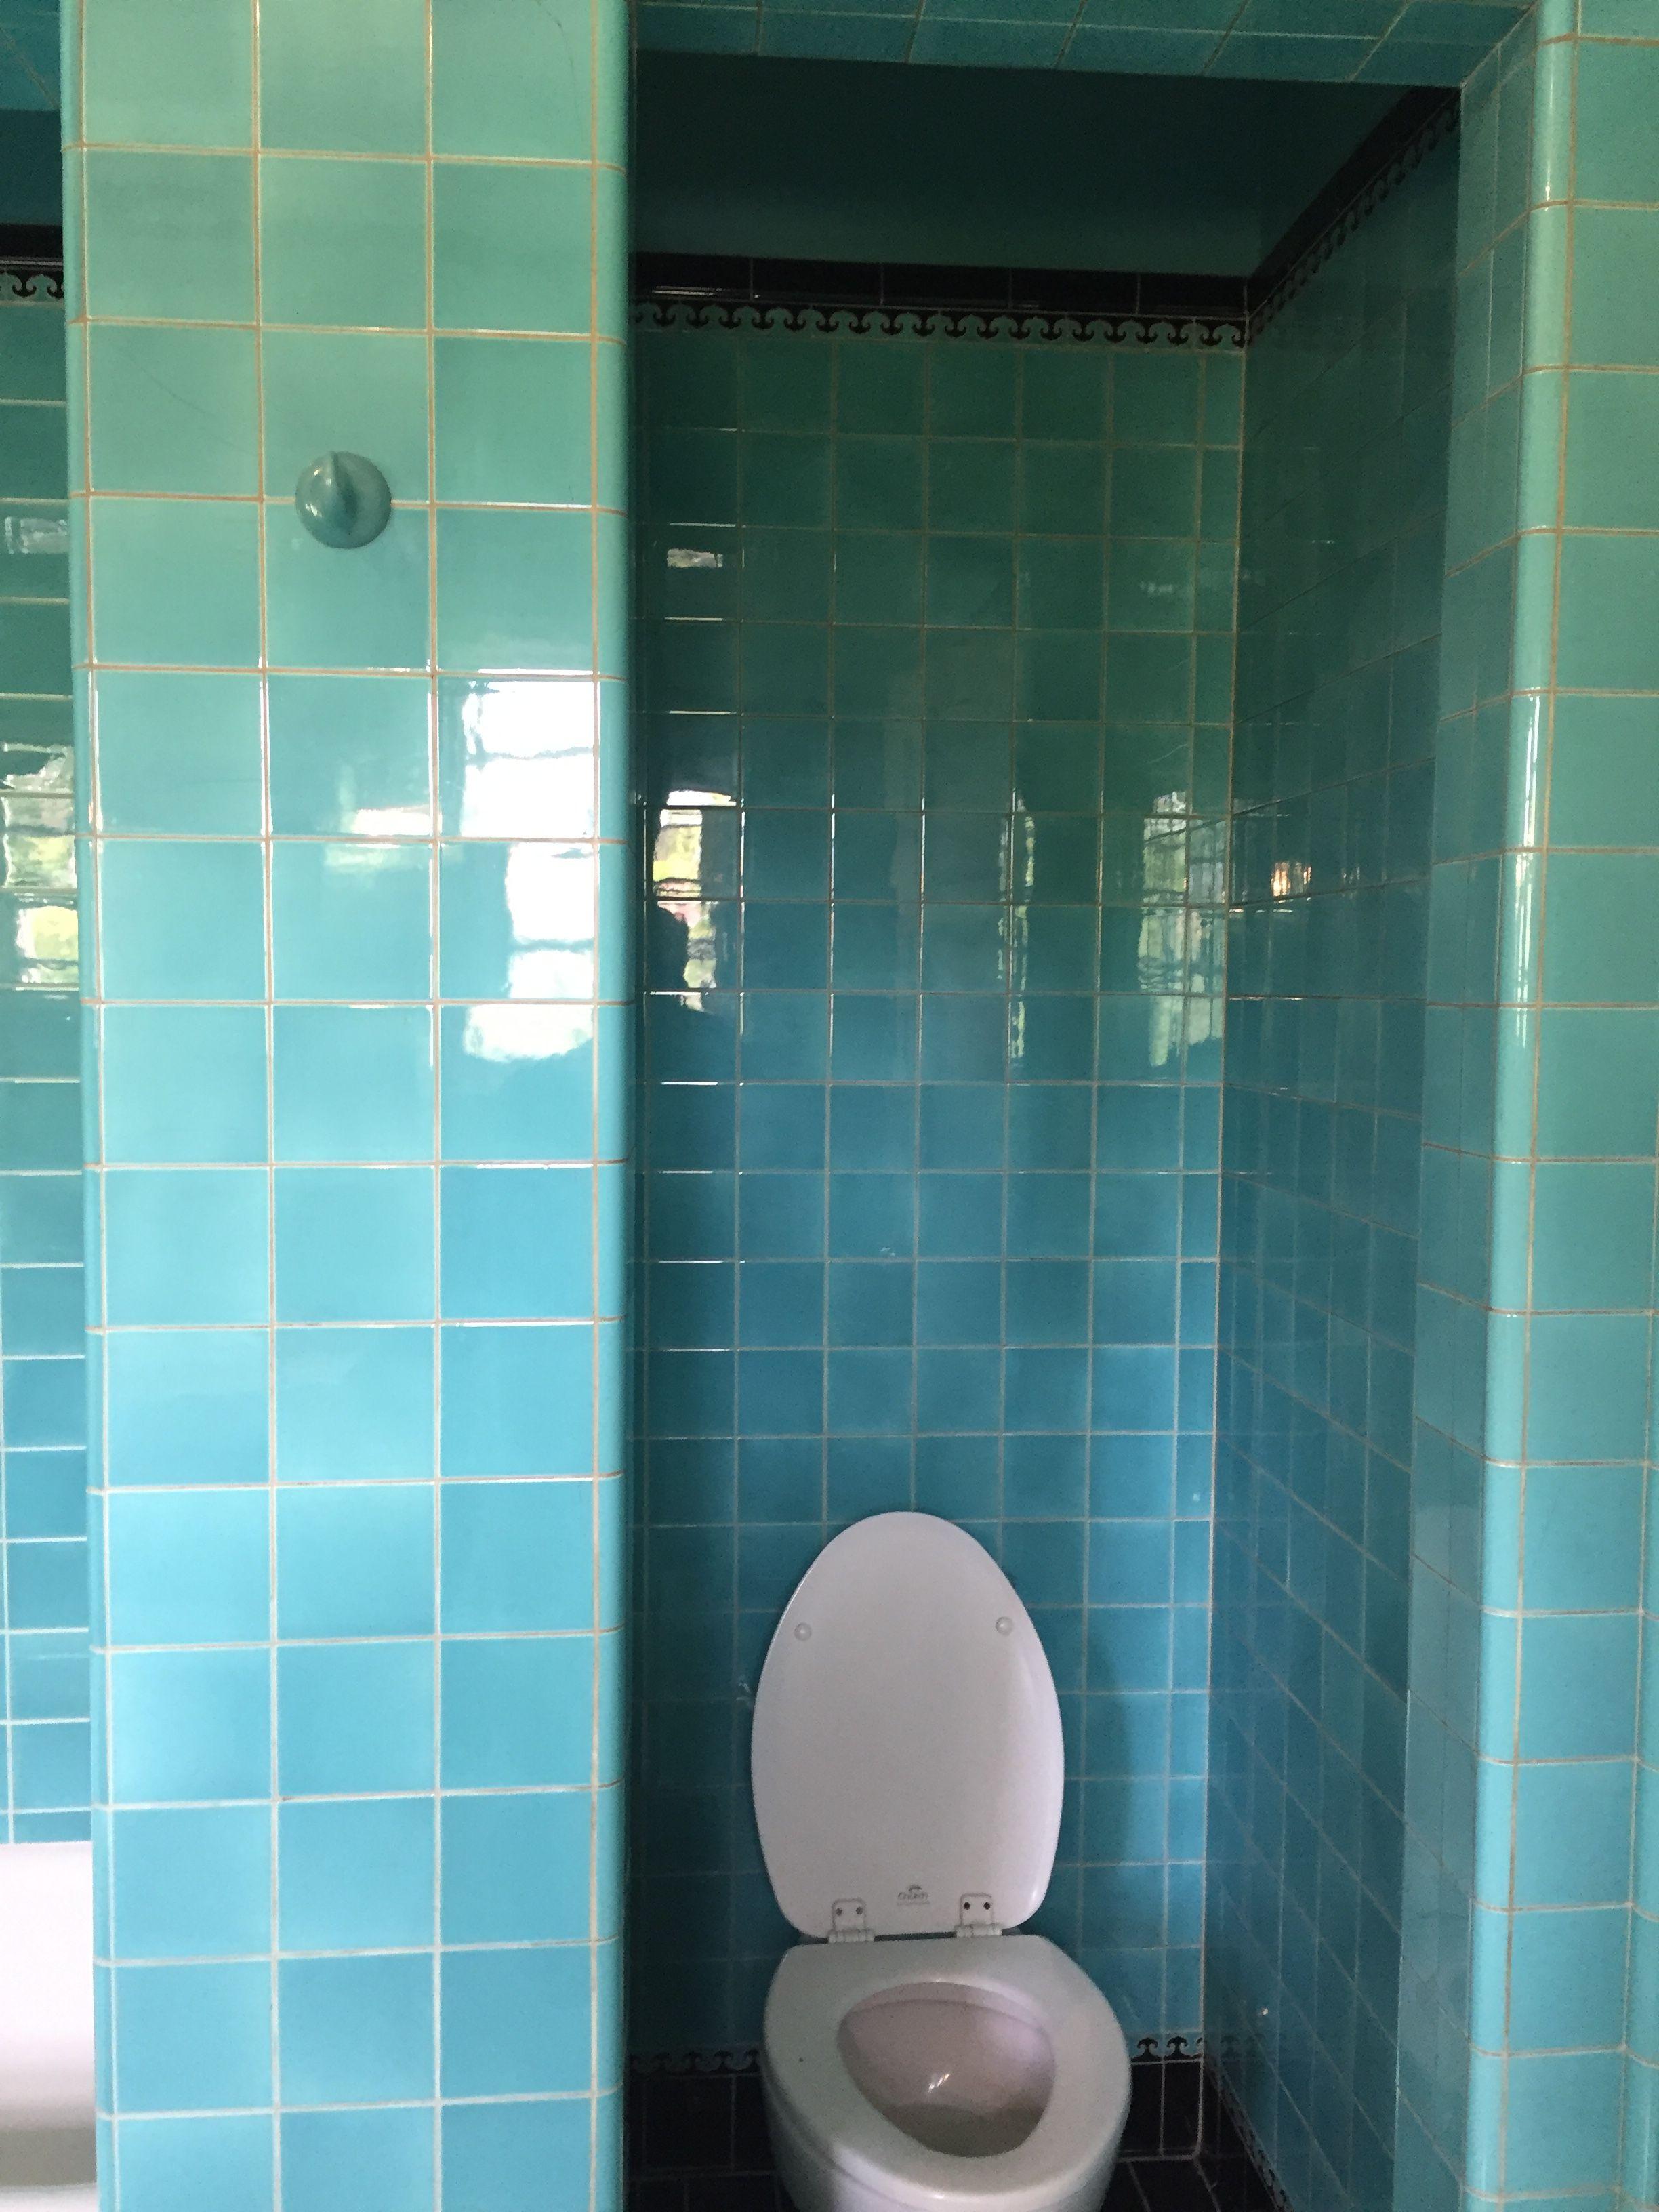 Vintage bathroom interior pin by brooke on us tiled bathrooms  pinterest  vintage